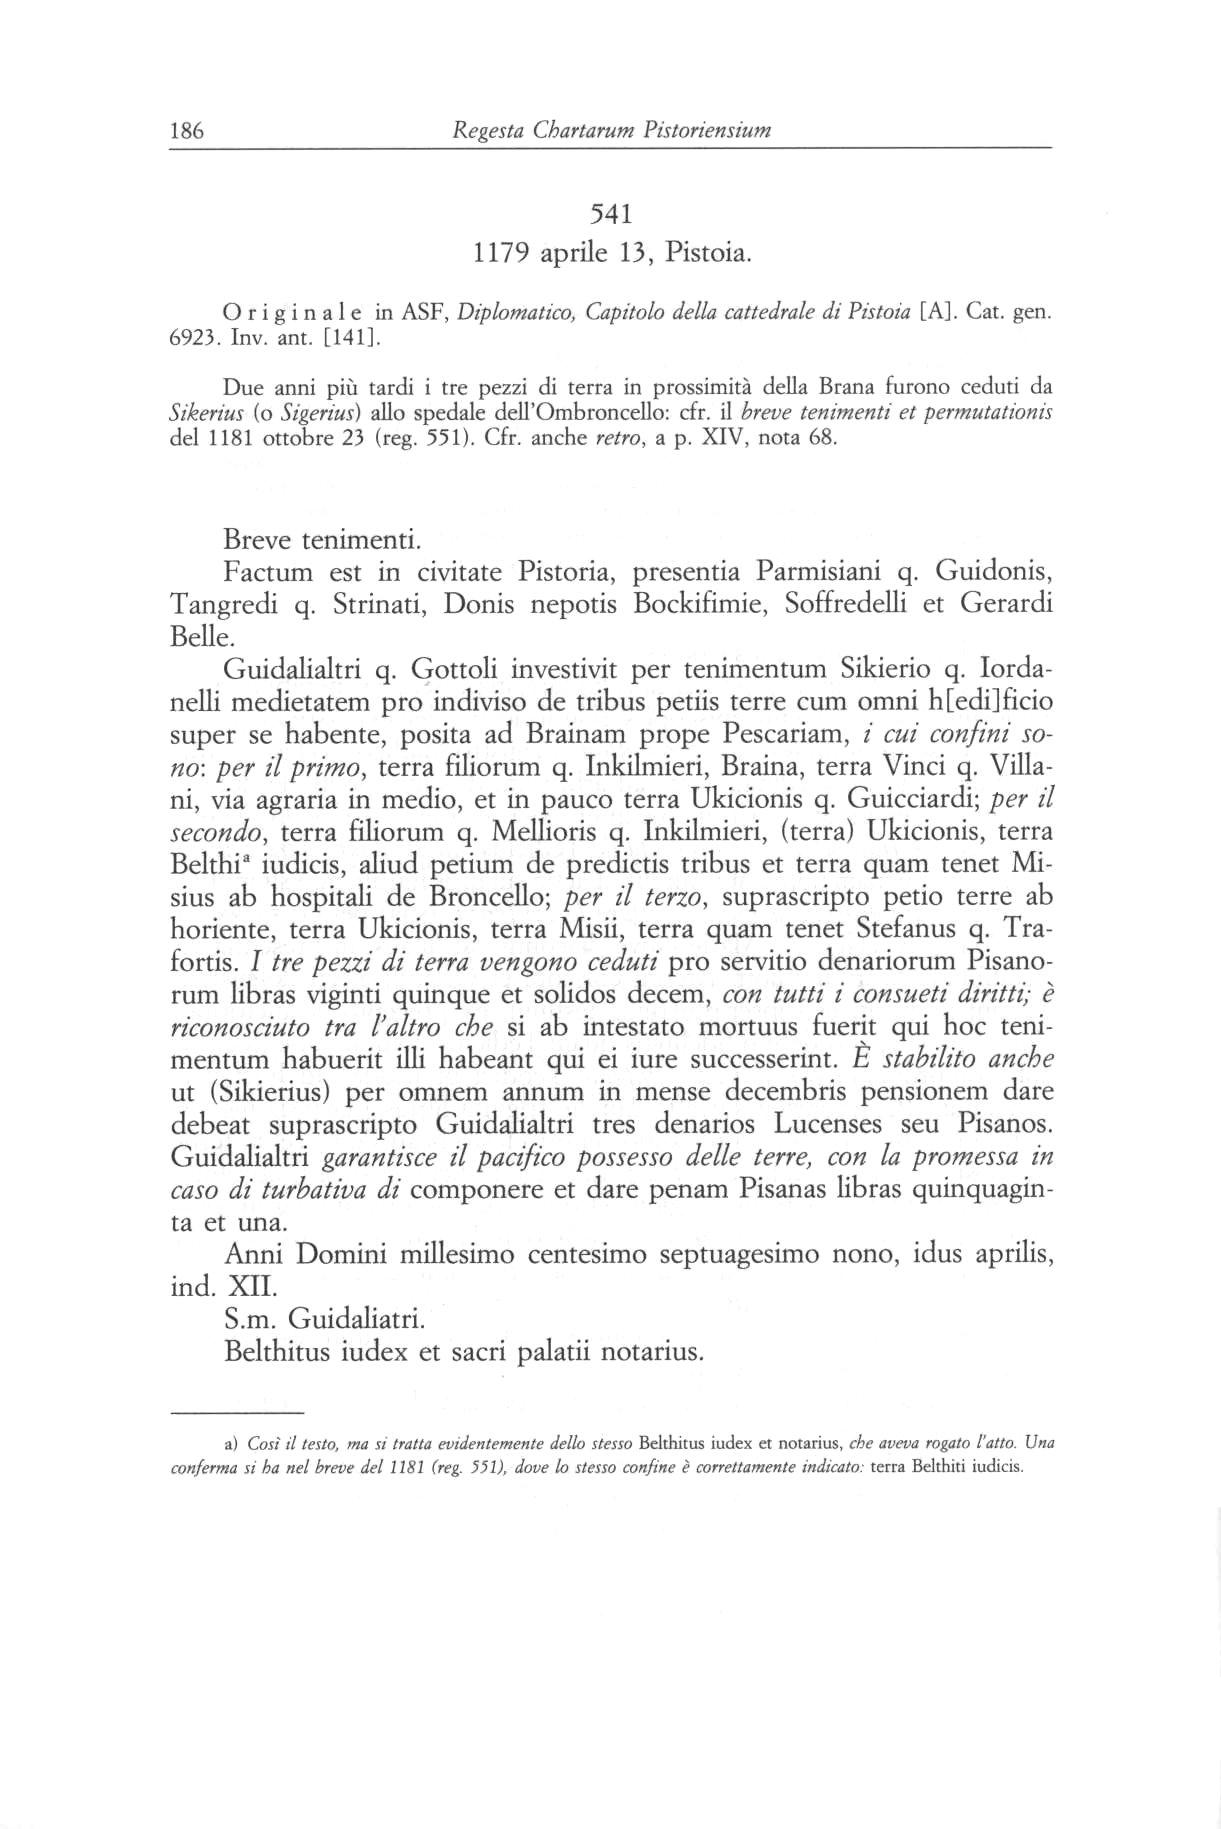 Canonica S. Zenone XII 0186.jpg